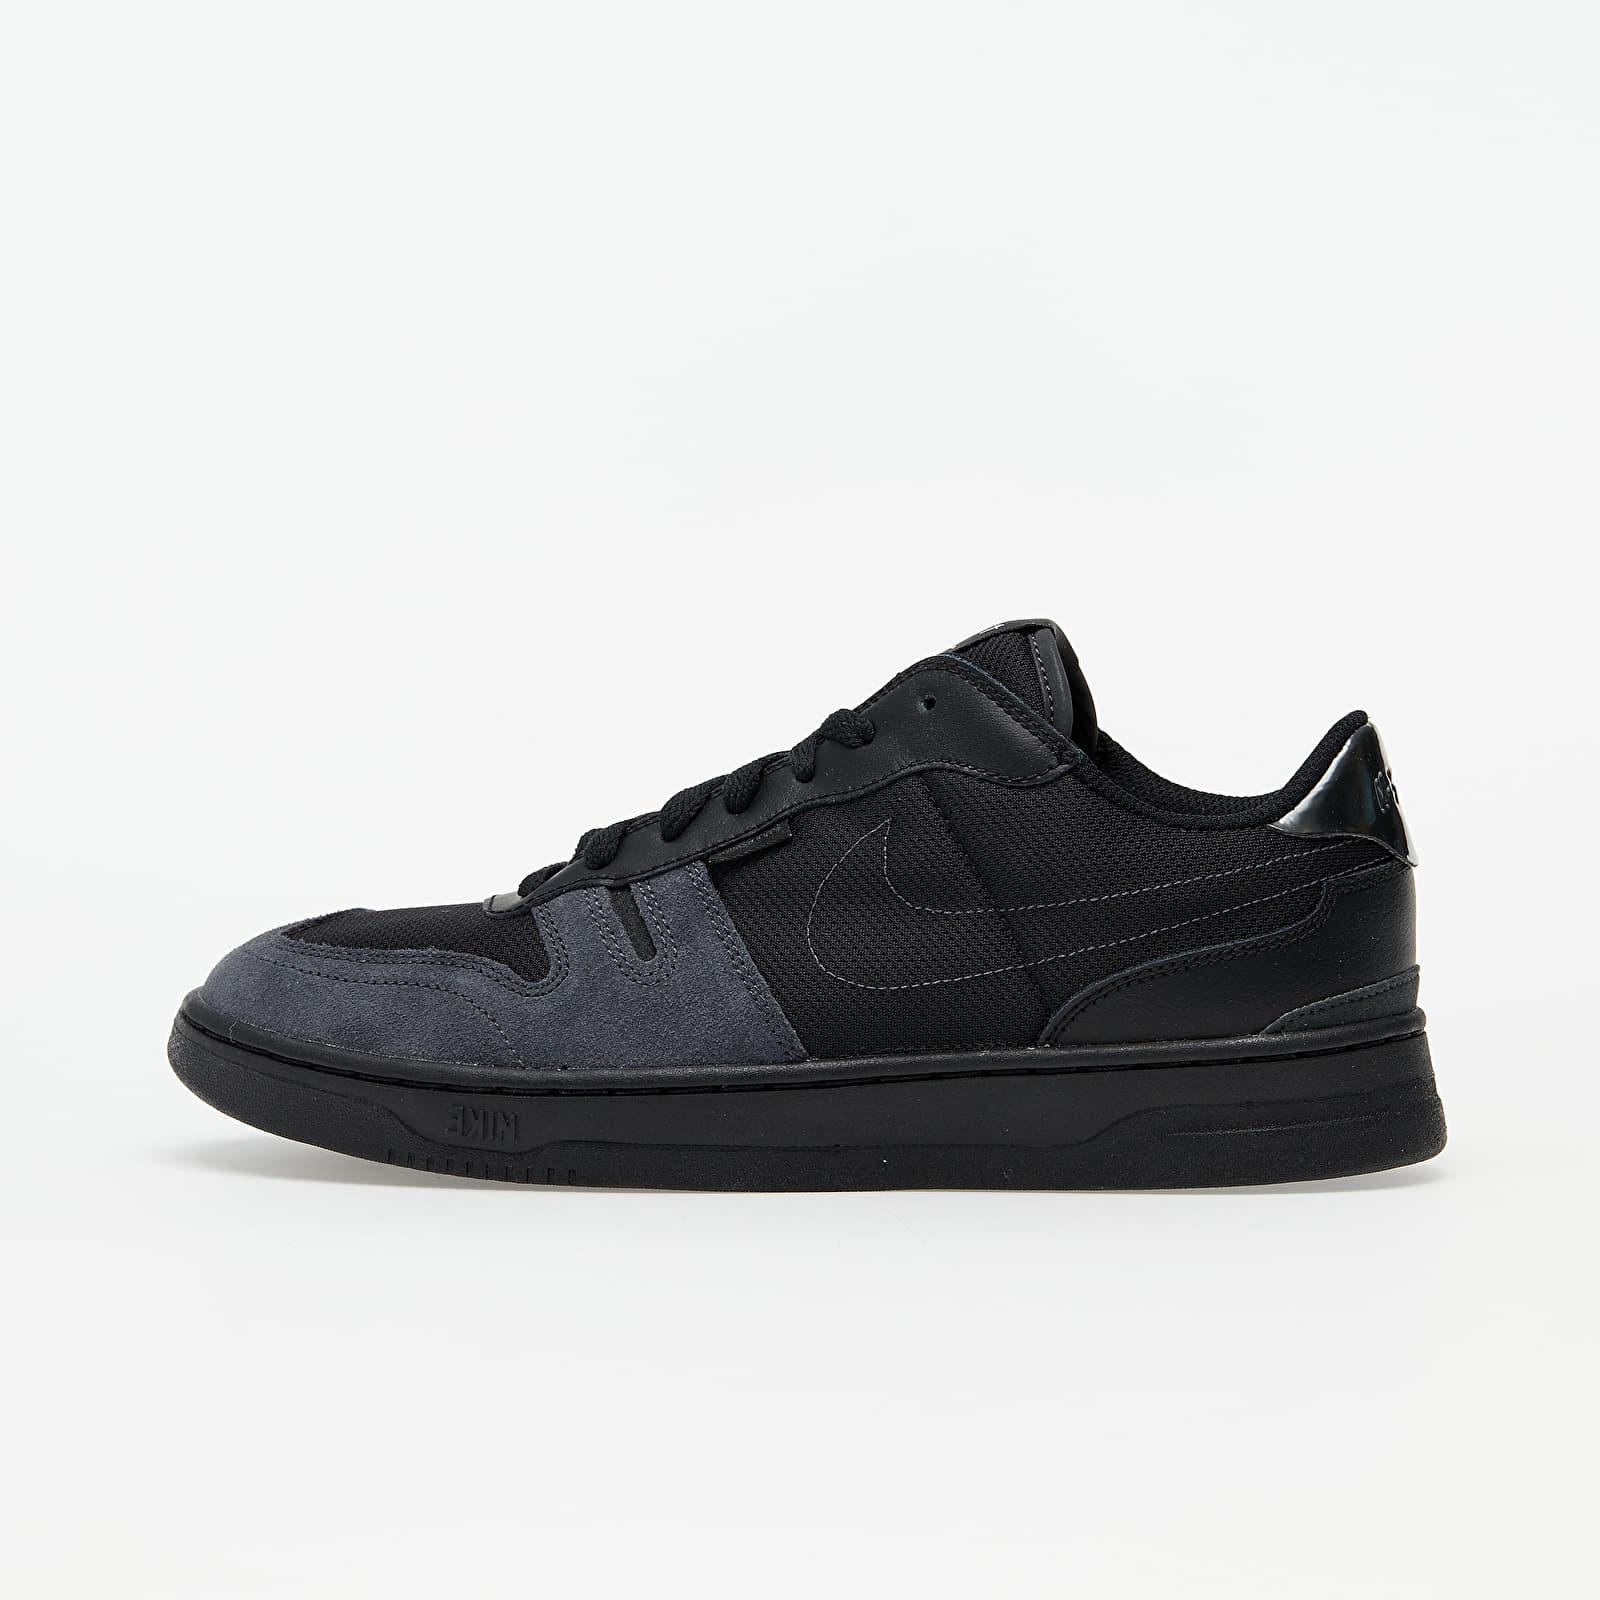 Männer Nike Squash-Type Black/ Anthracite